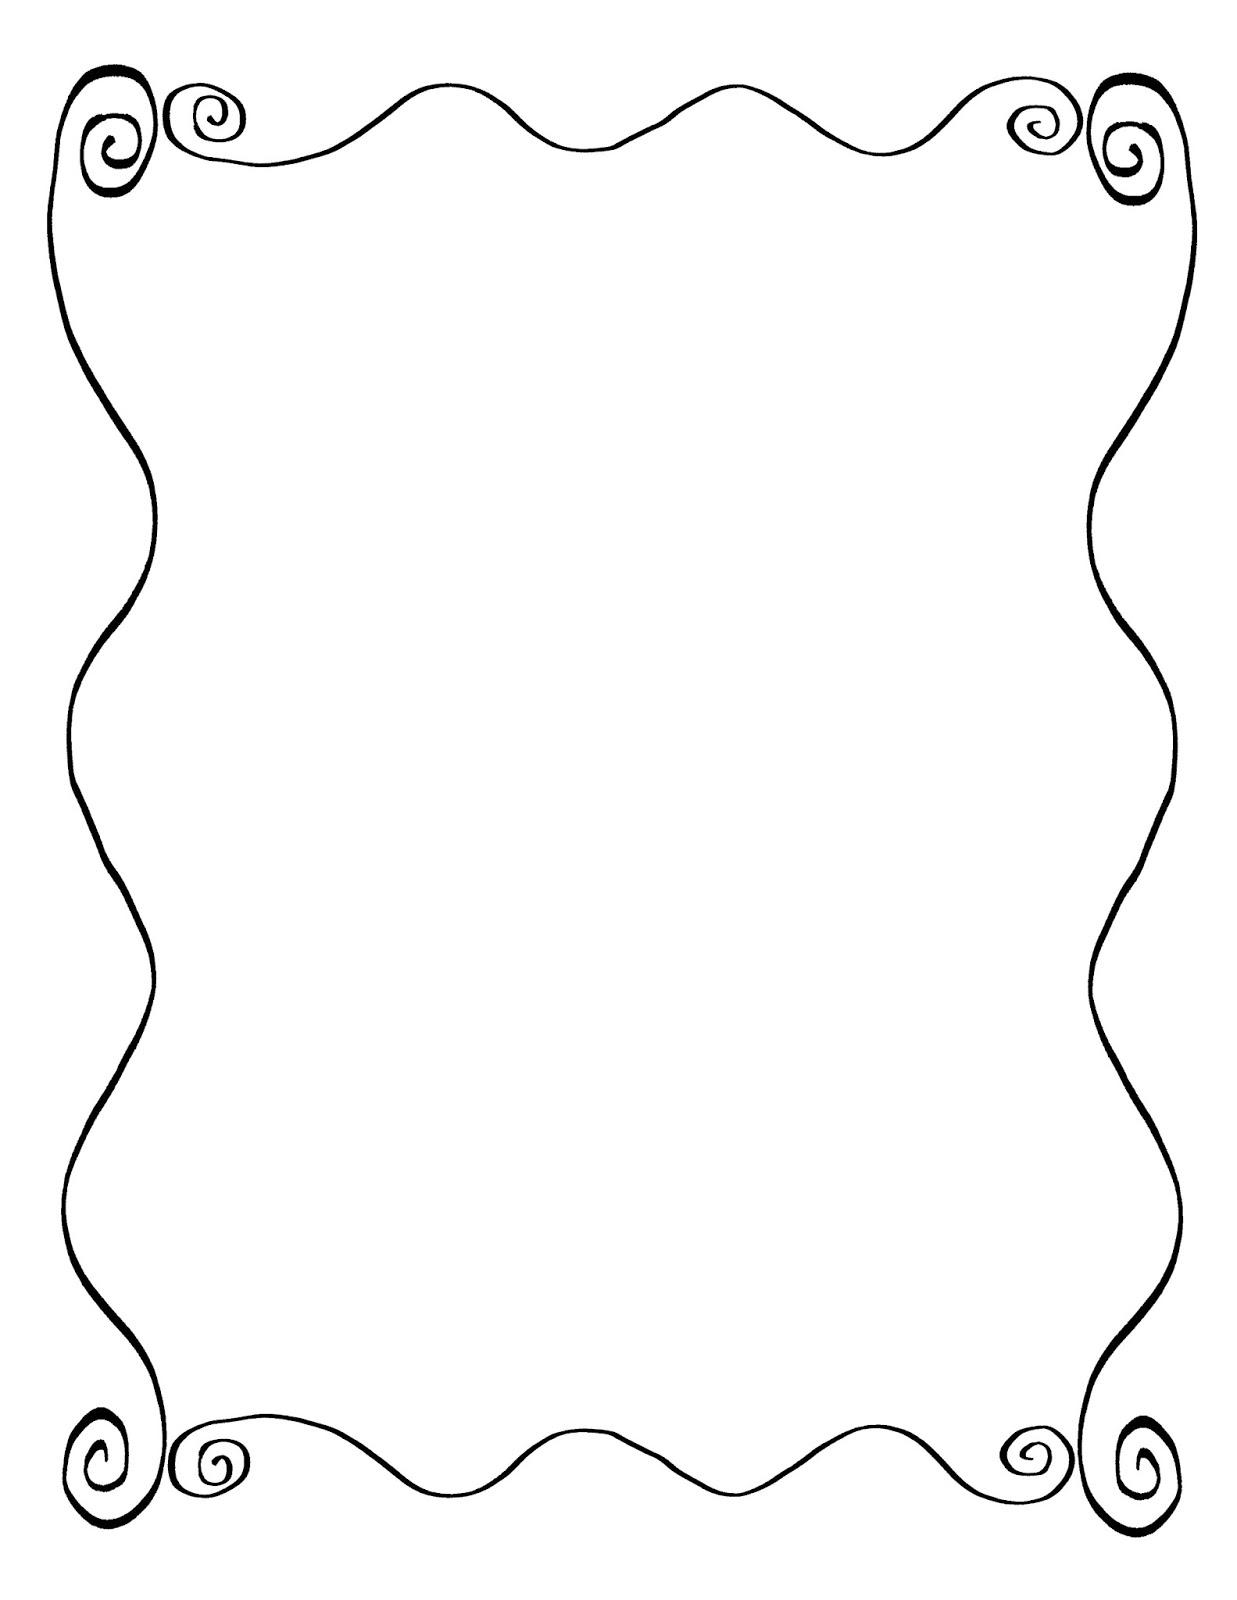 1237x1600 Digital Stamp Design Hand Drawn Decorative Frame Digital Wavy